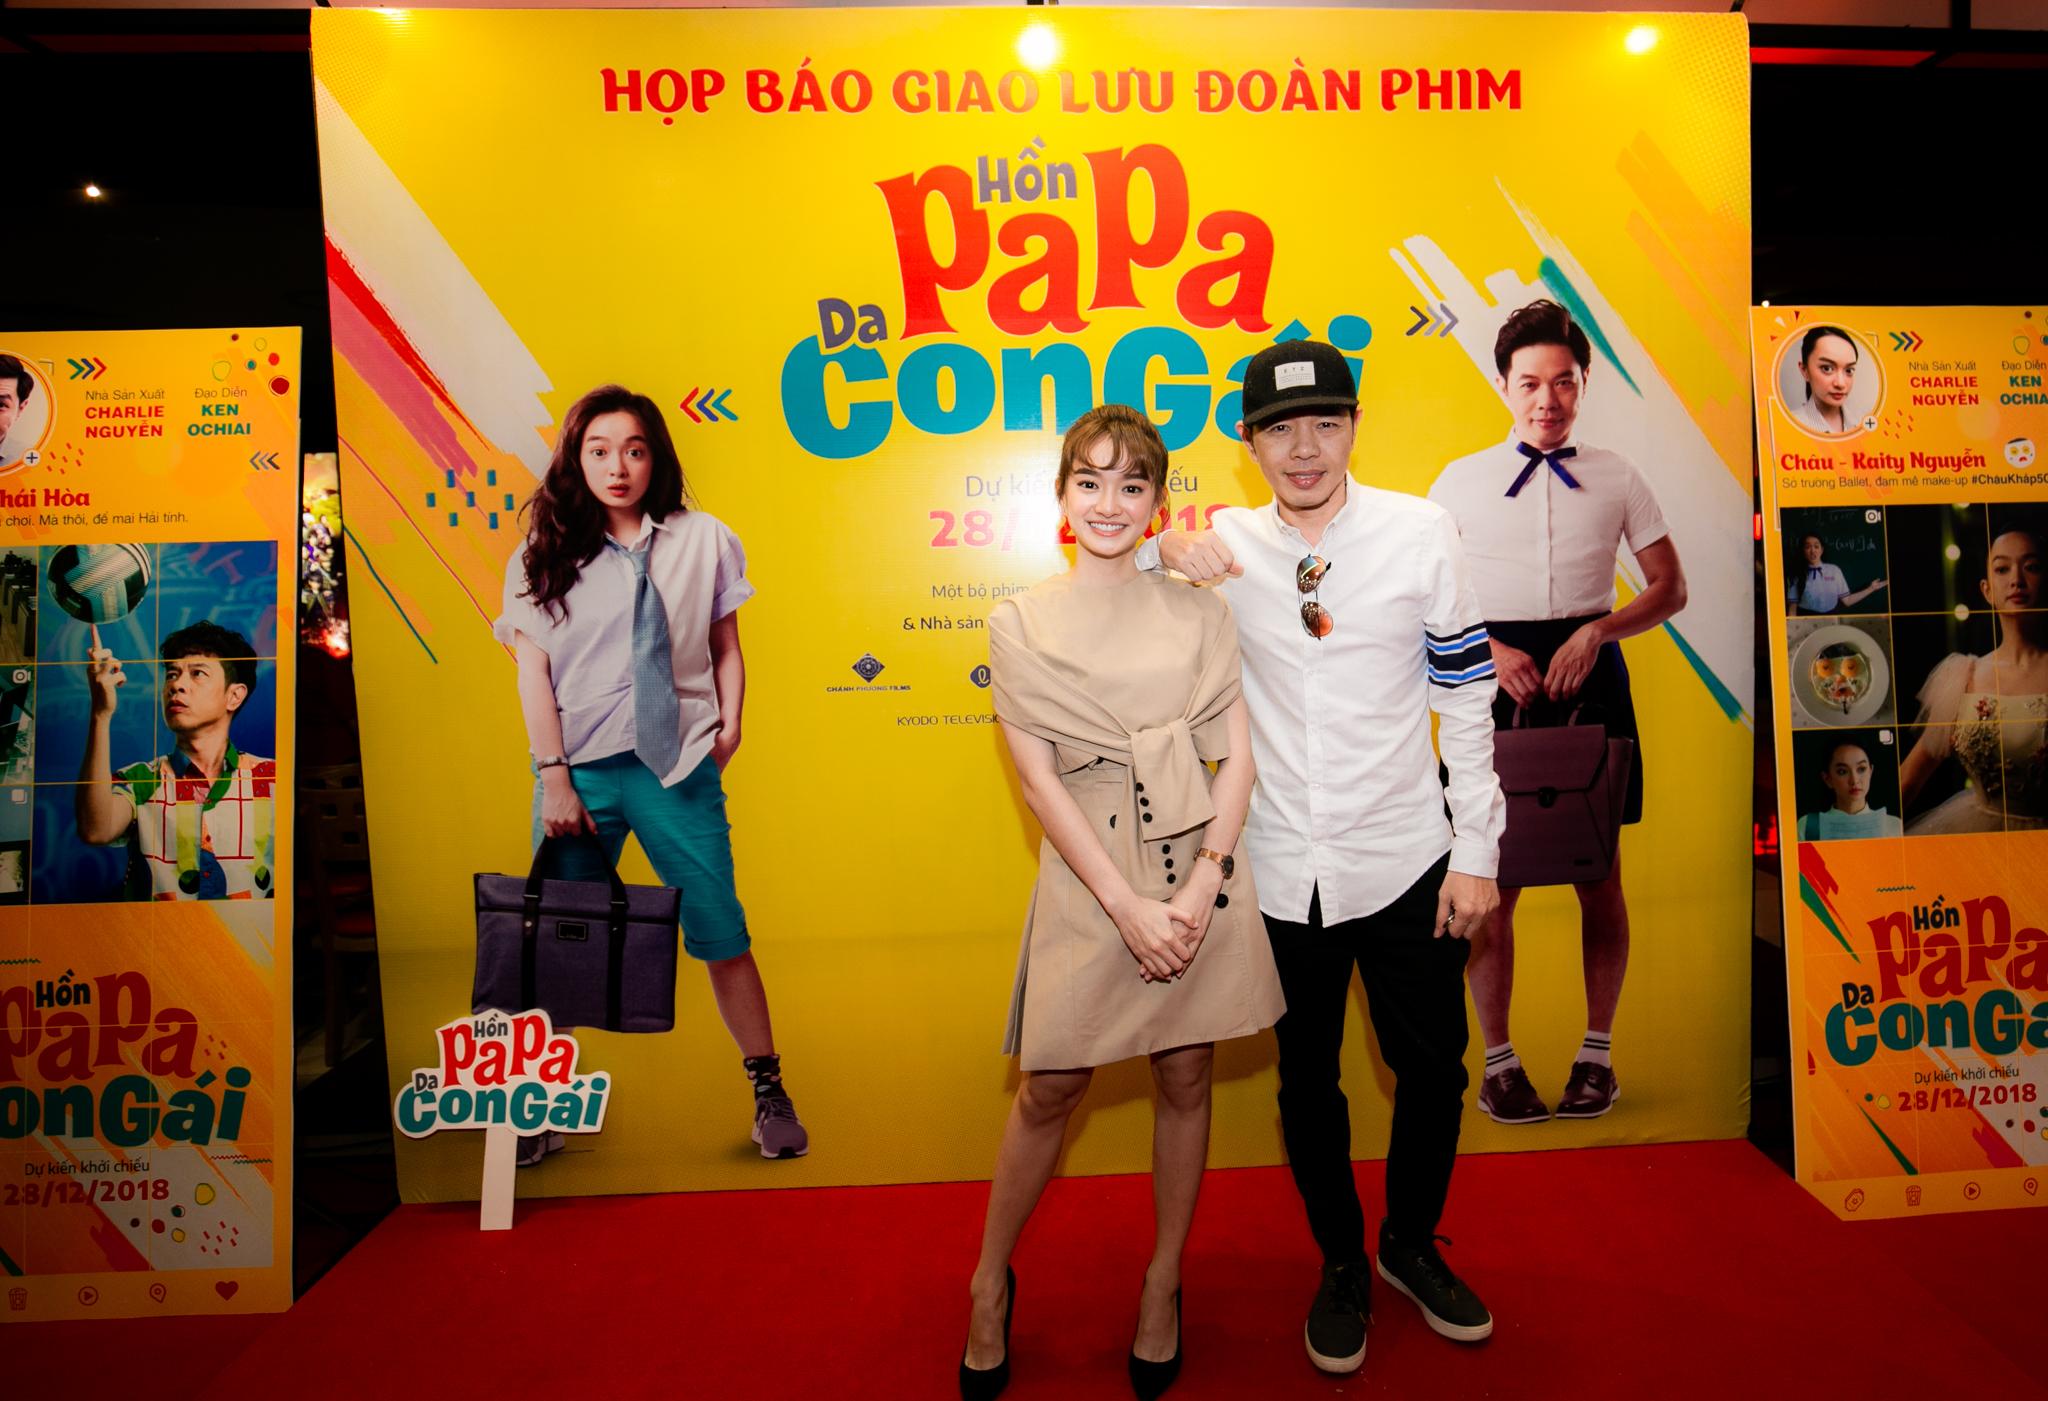 showcase giới thiệu Hồn Papa Da Con Gái 11